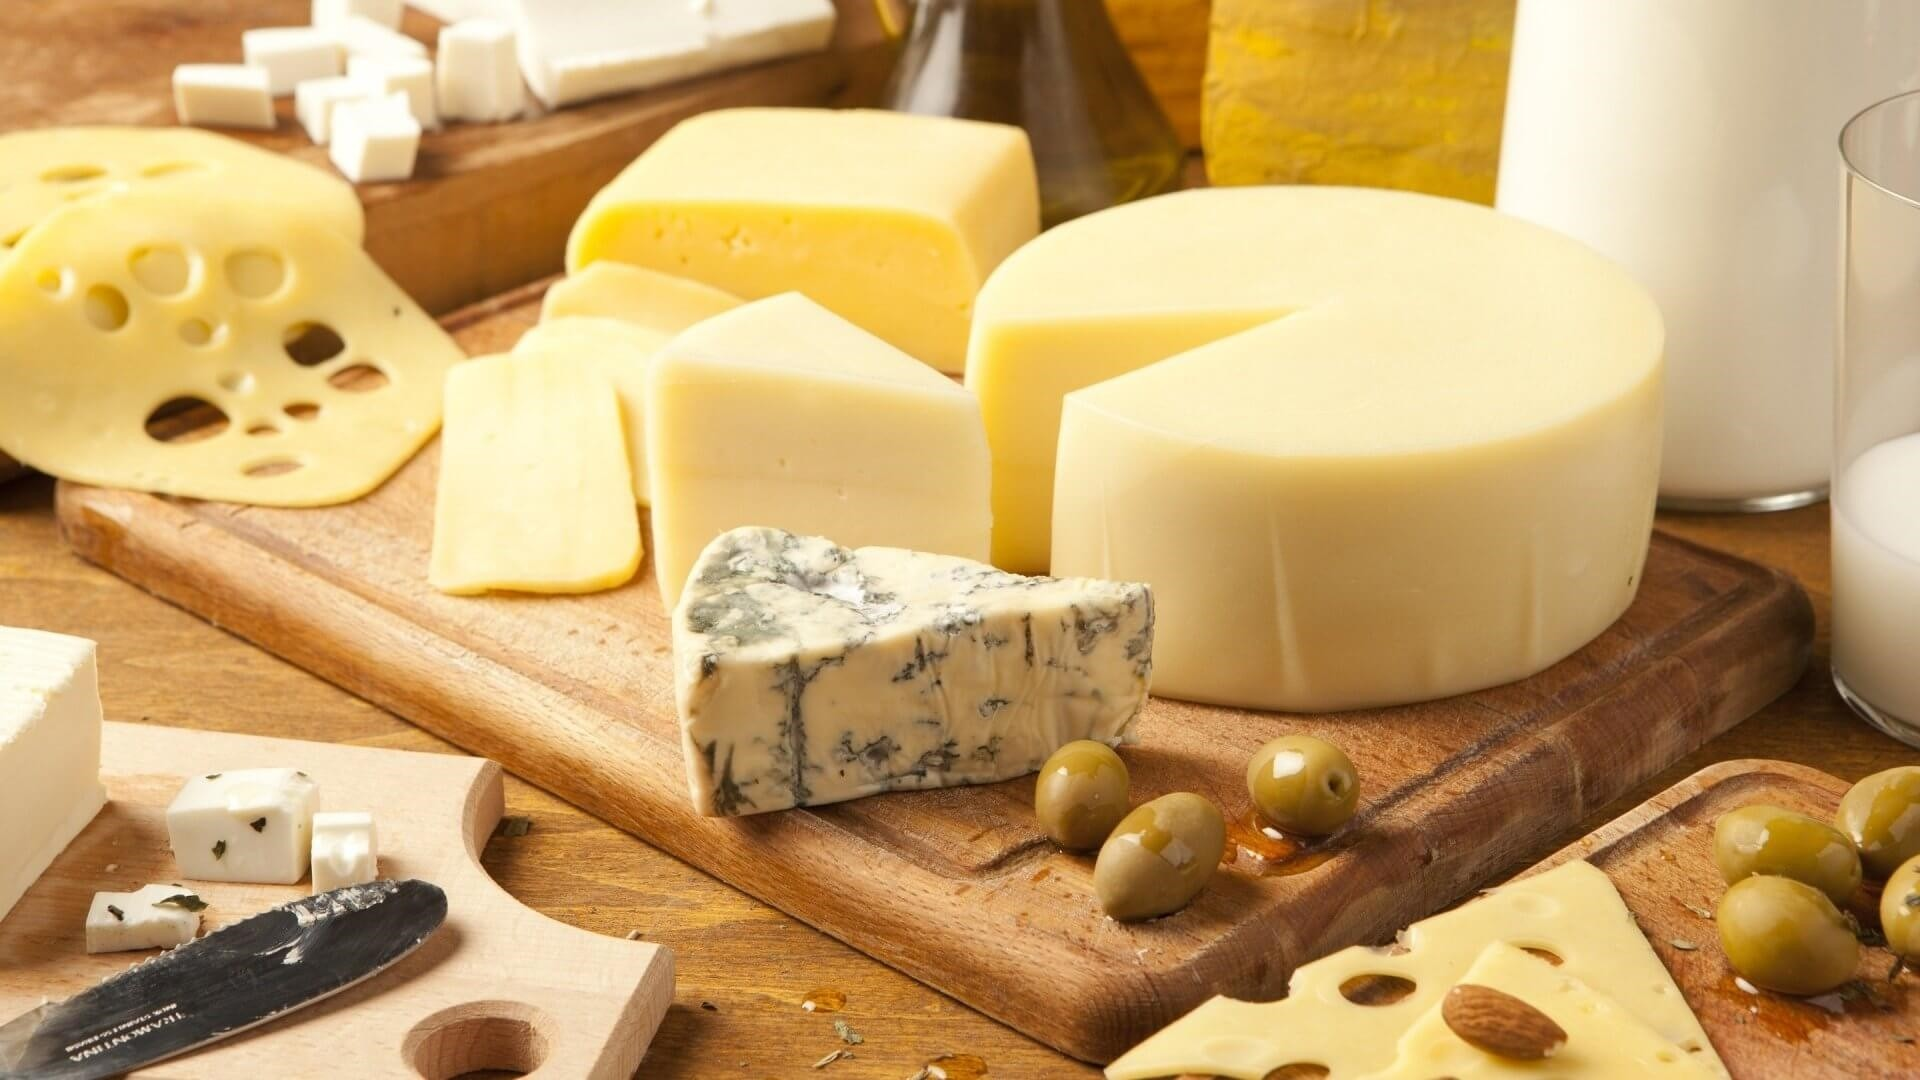 Cheese Wallpaper 1920x1080